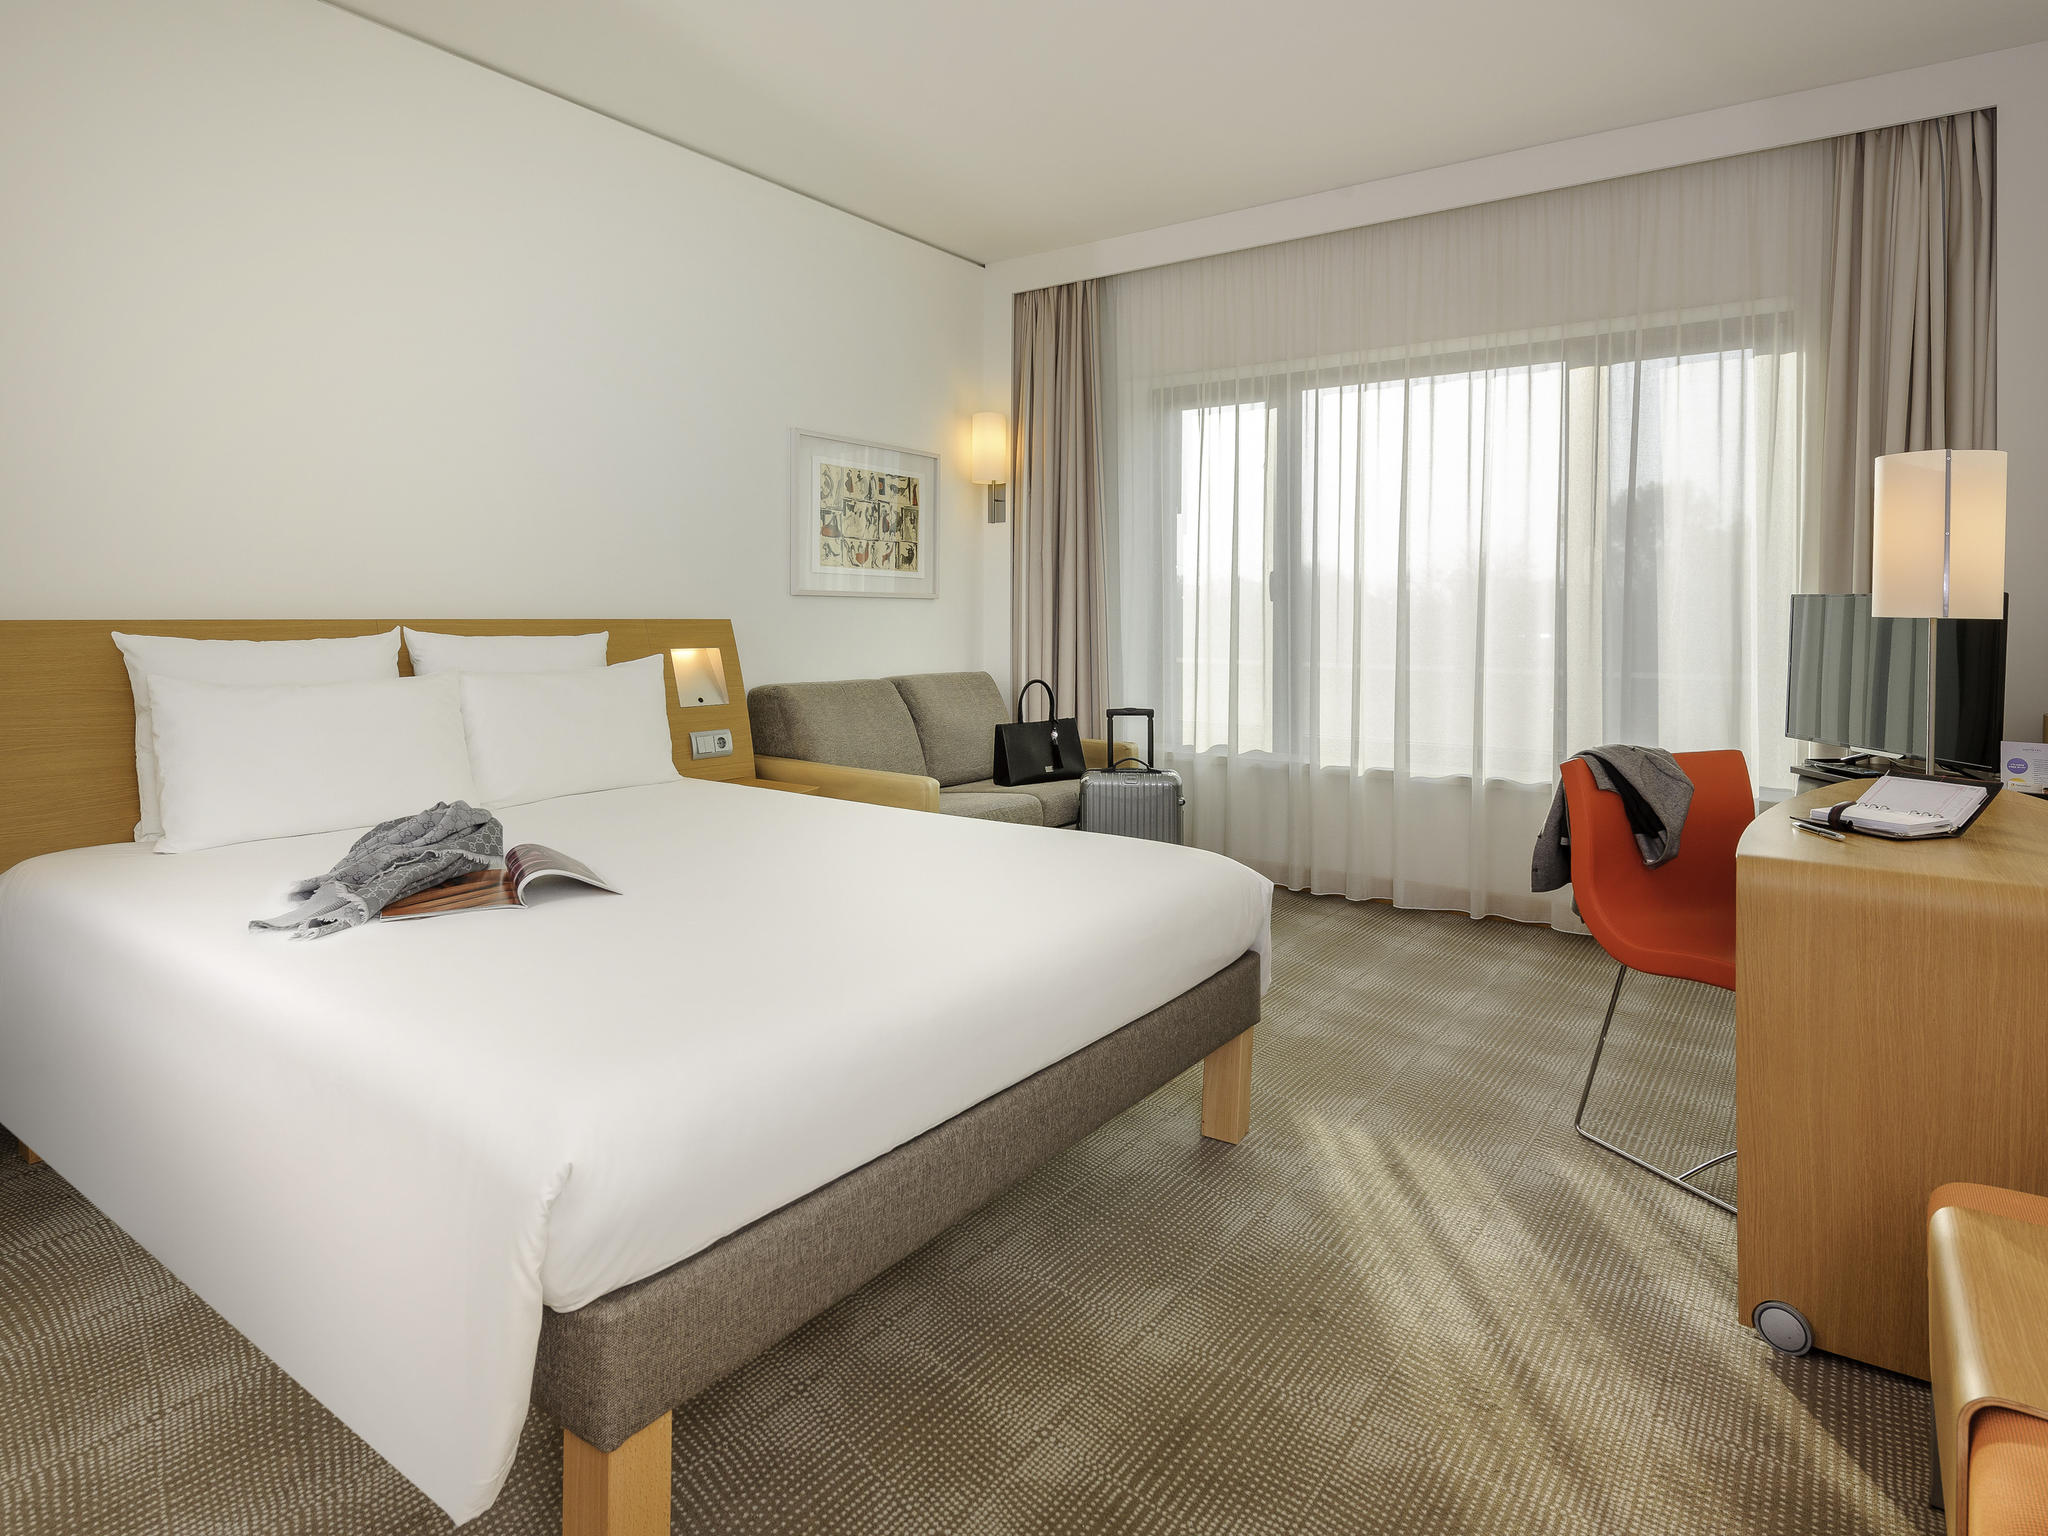 Hotel in Berlin - Novotel Berlin am Tiergarten buchen